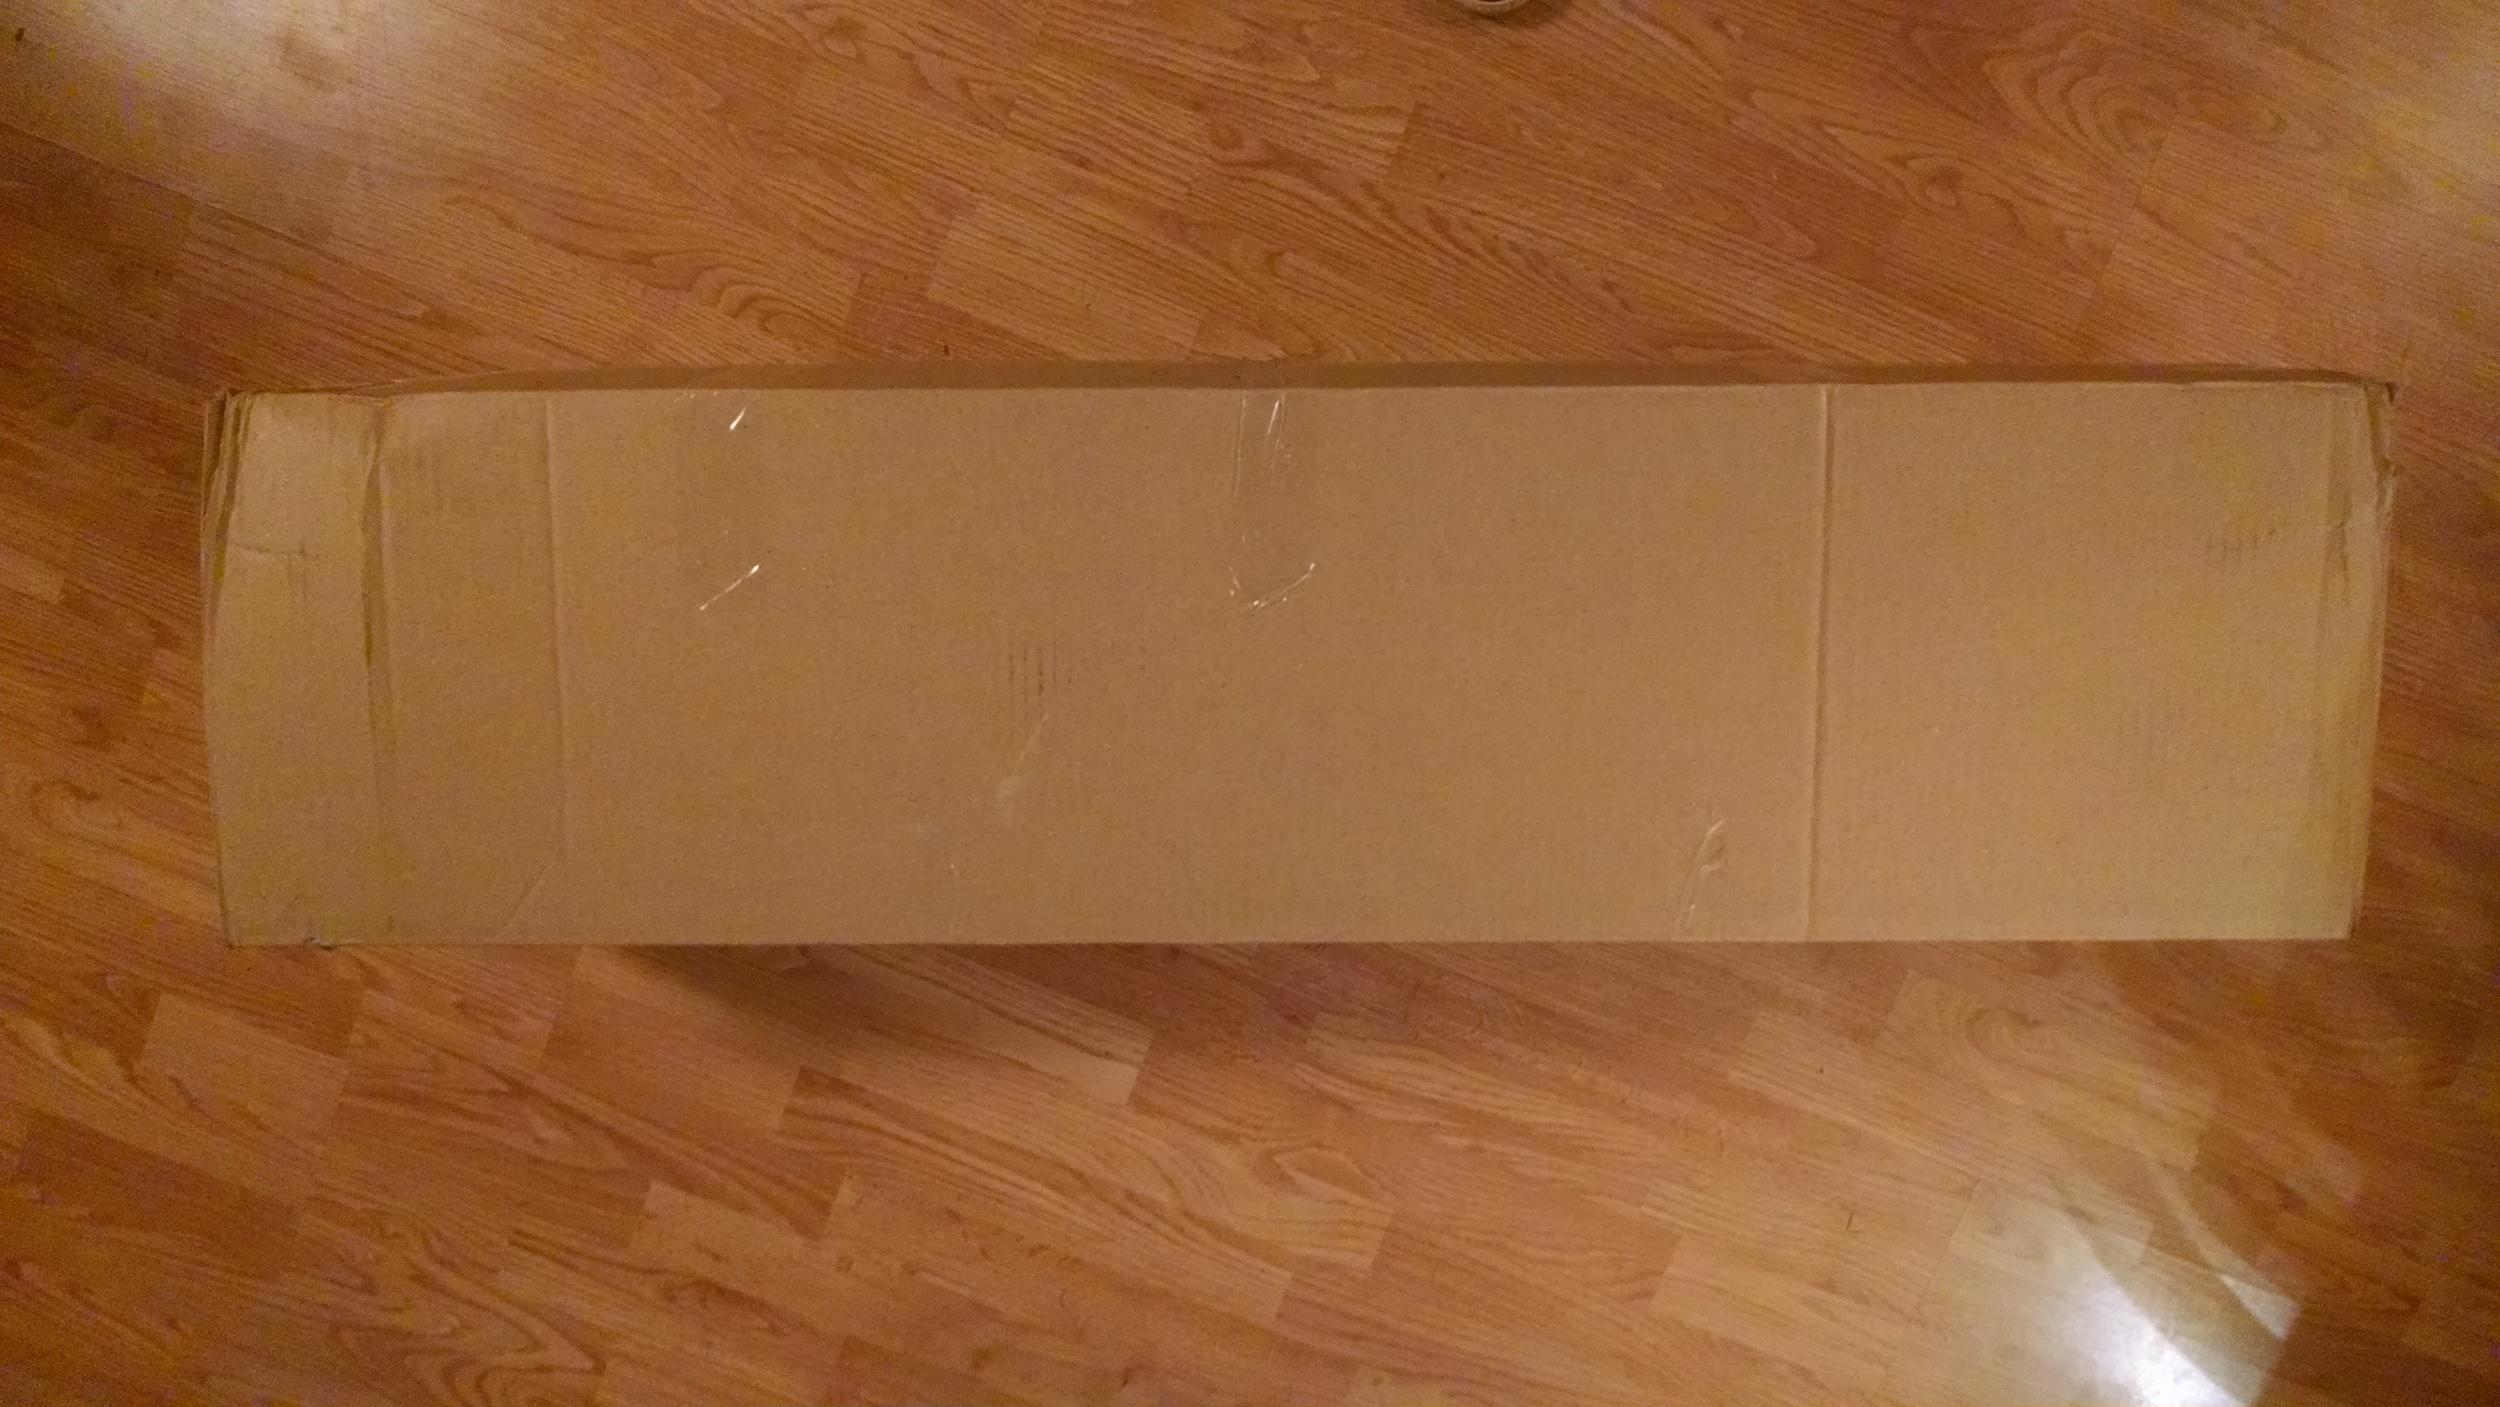 Our Long-Awaited Box